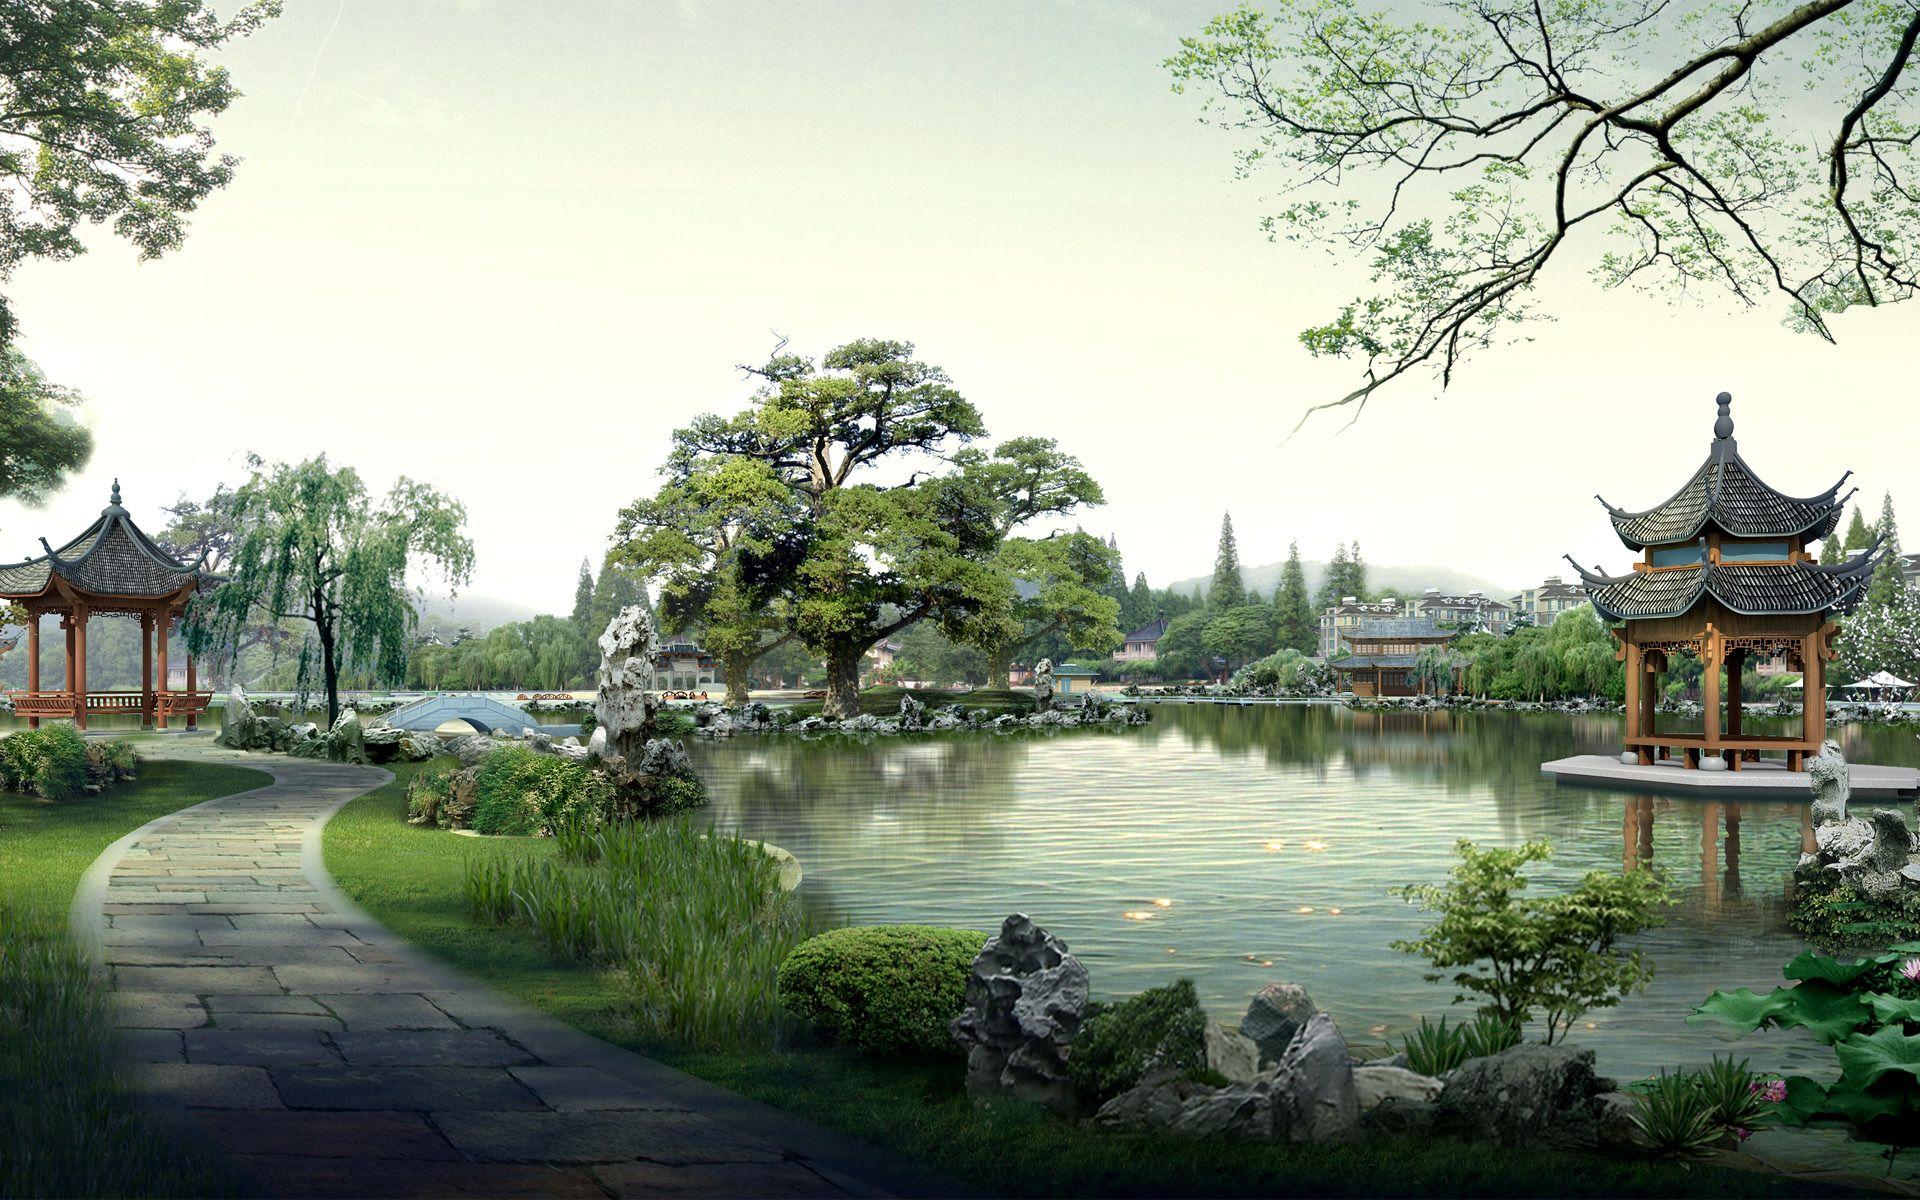 Landscape Nature Hd Garden Chinese Landscape Photography Inspiration Nature Japan Landscape